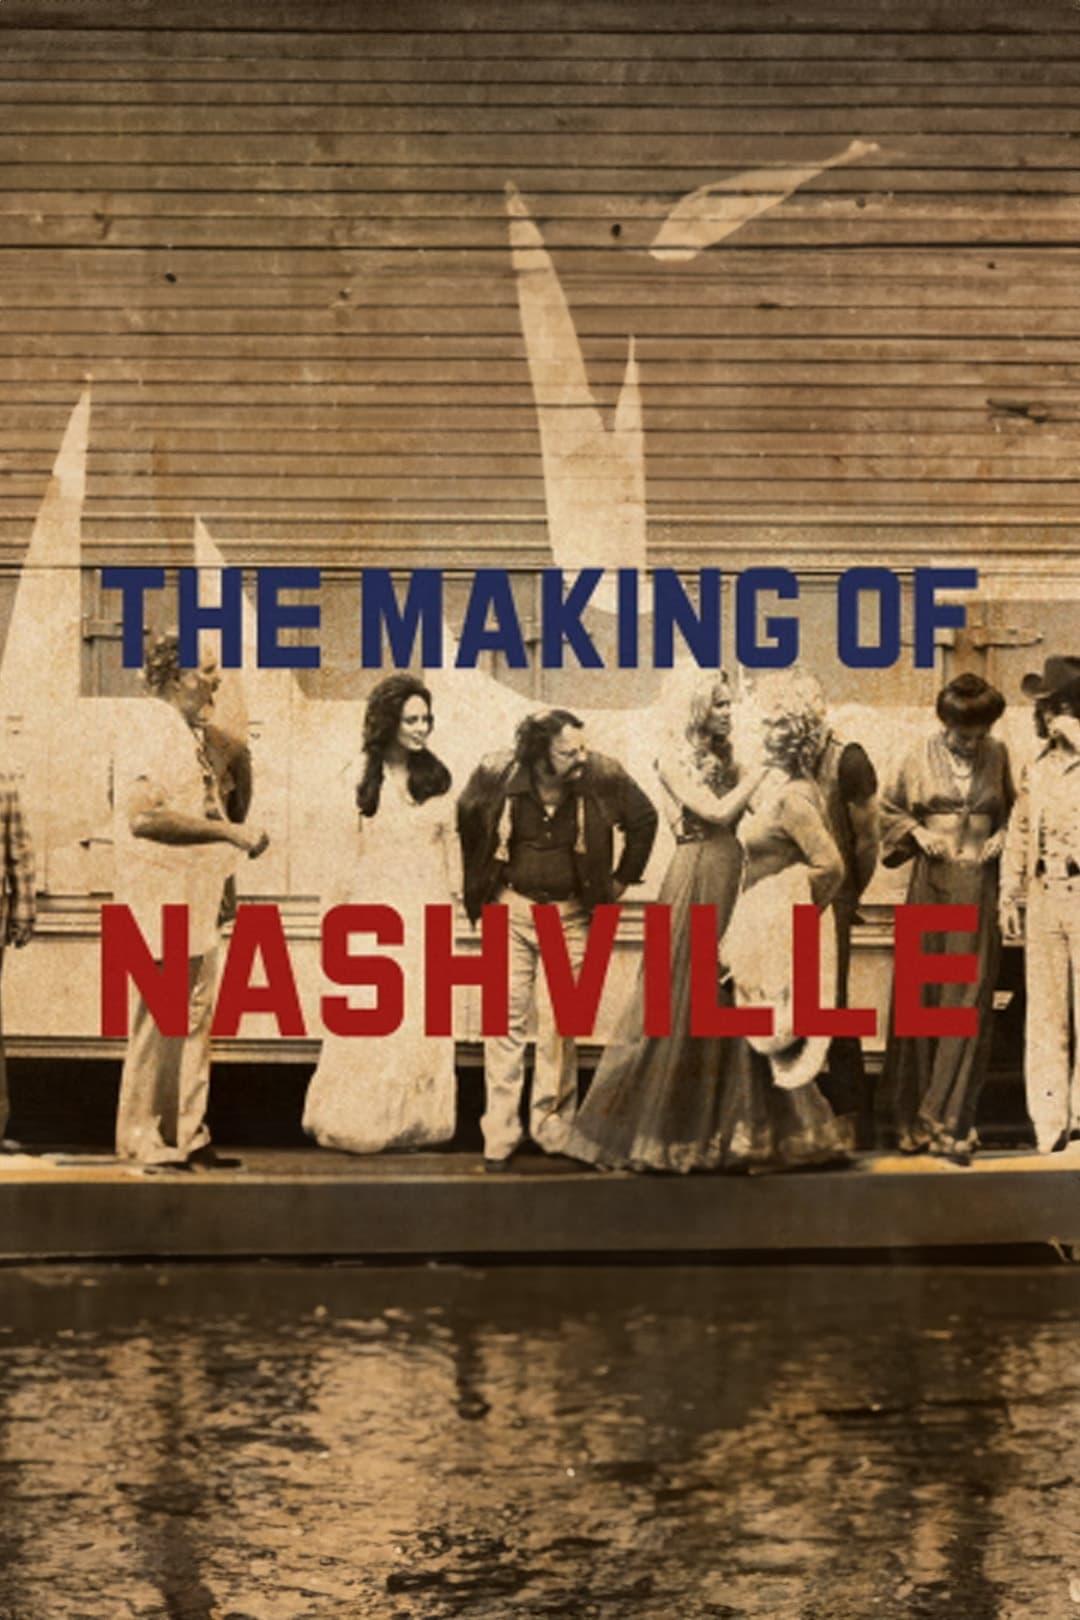 The Making of Nashville